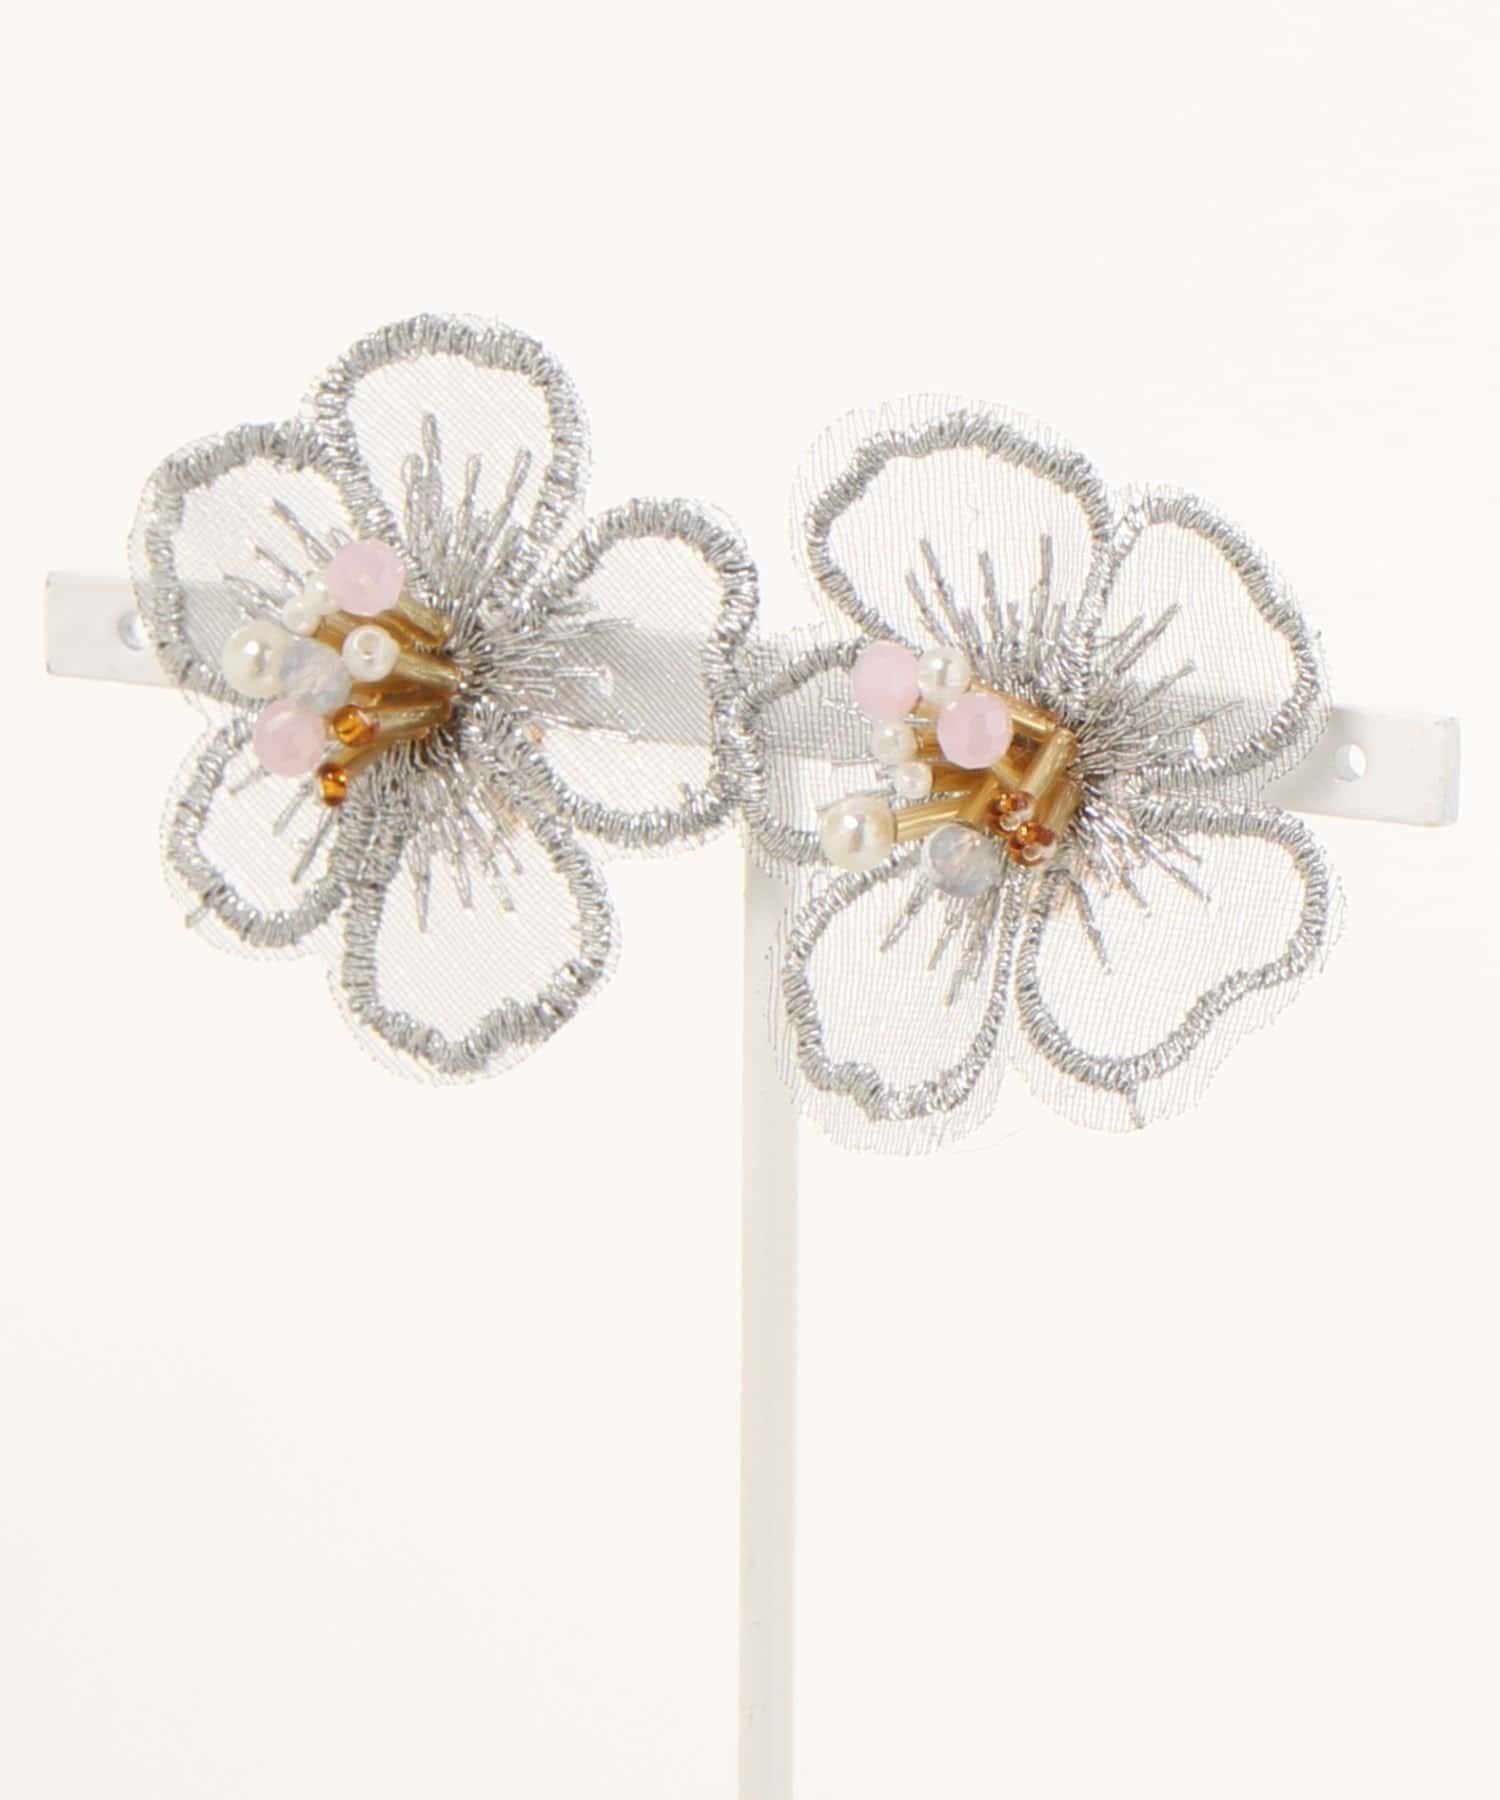 natural couture(ナチュラルクチュール) レディース 刺繍フラワーイヤリング ライトグレー